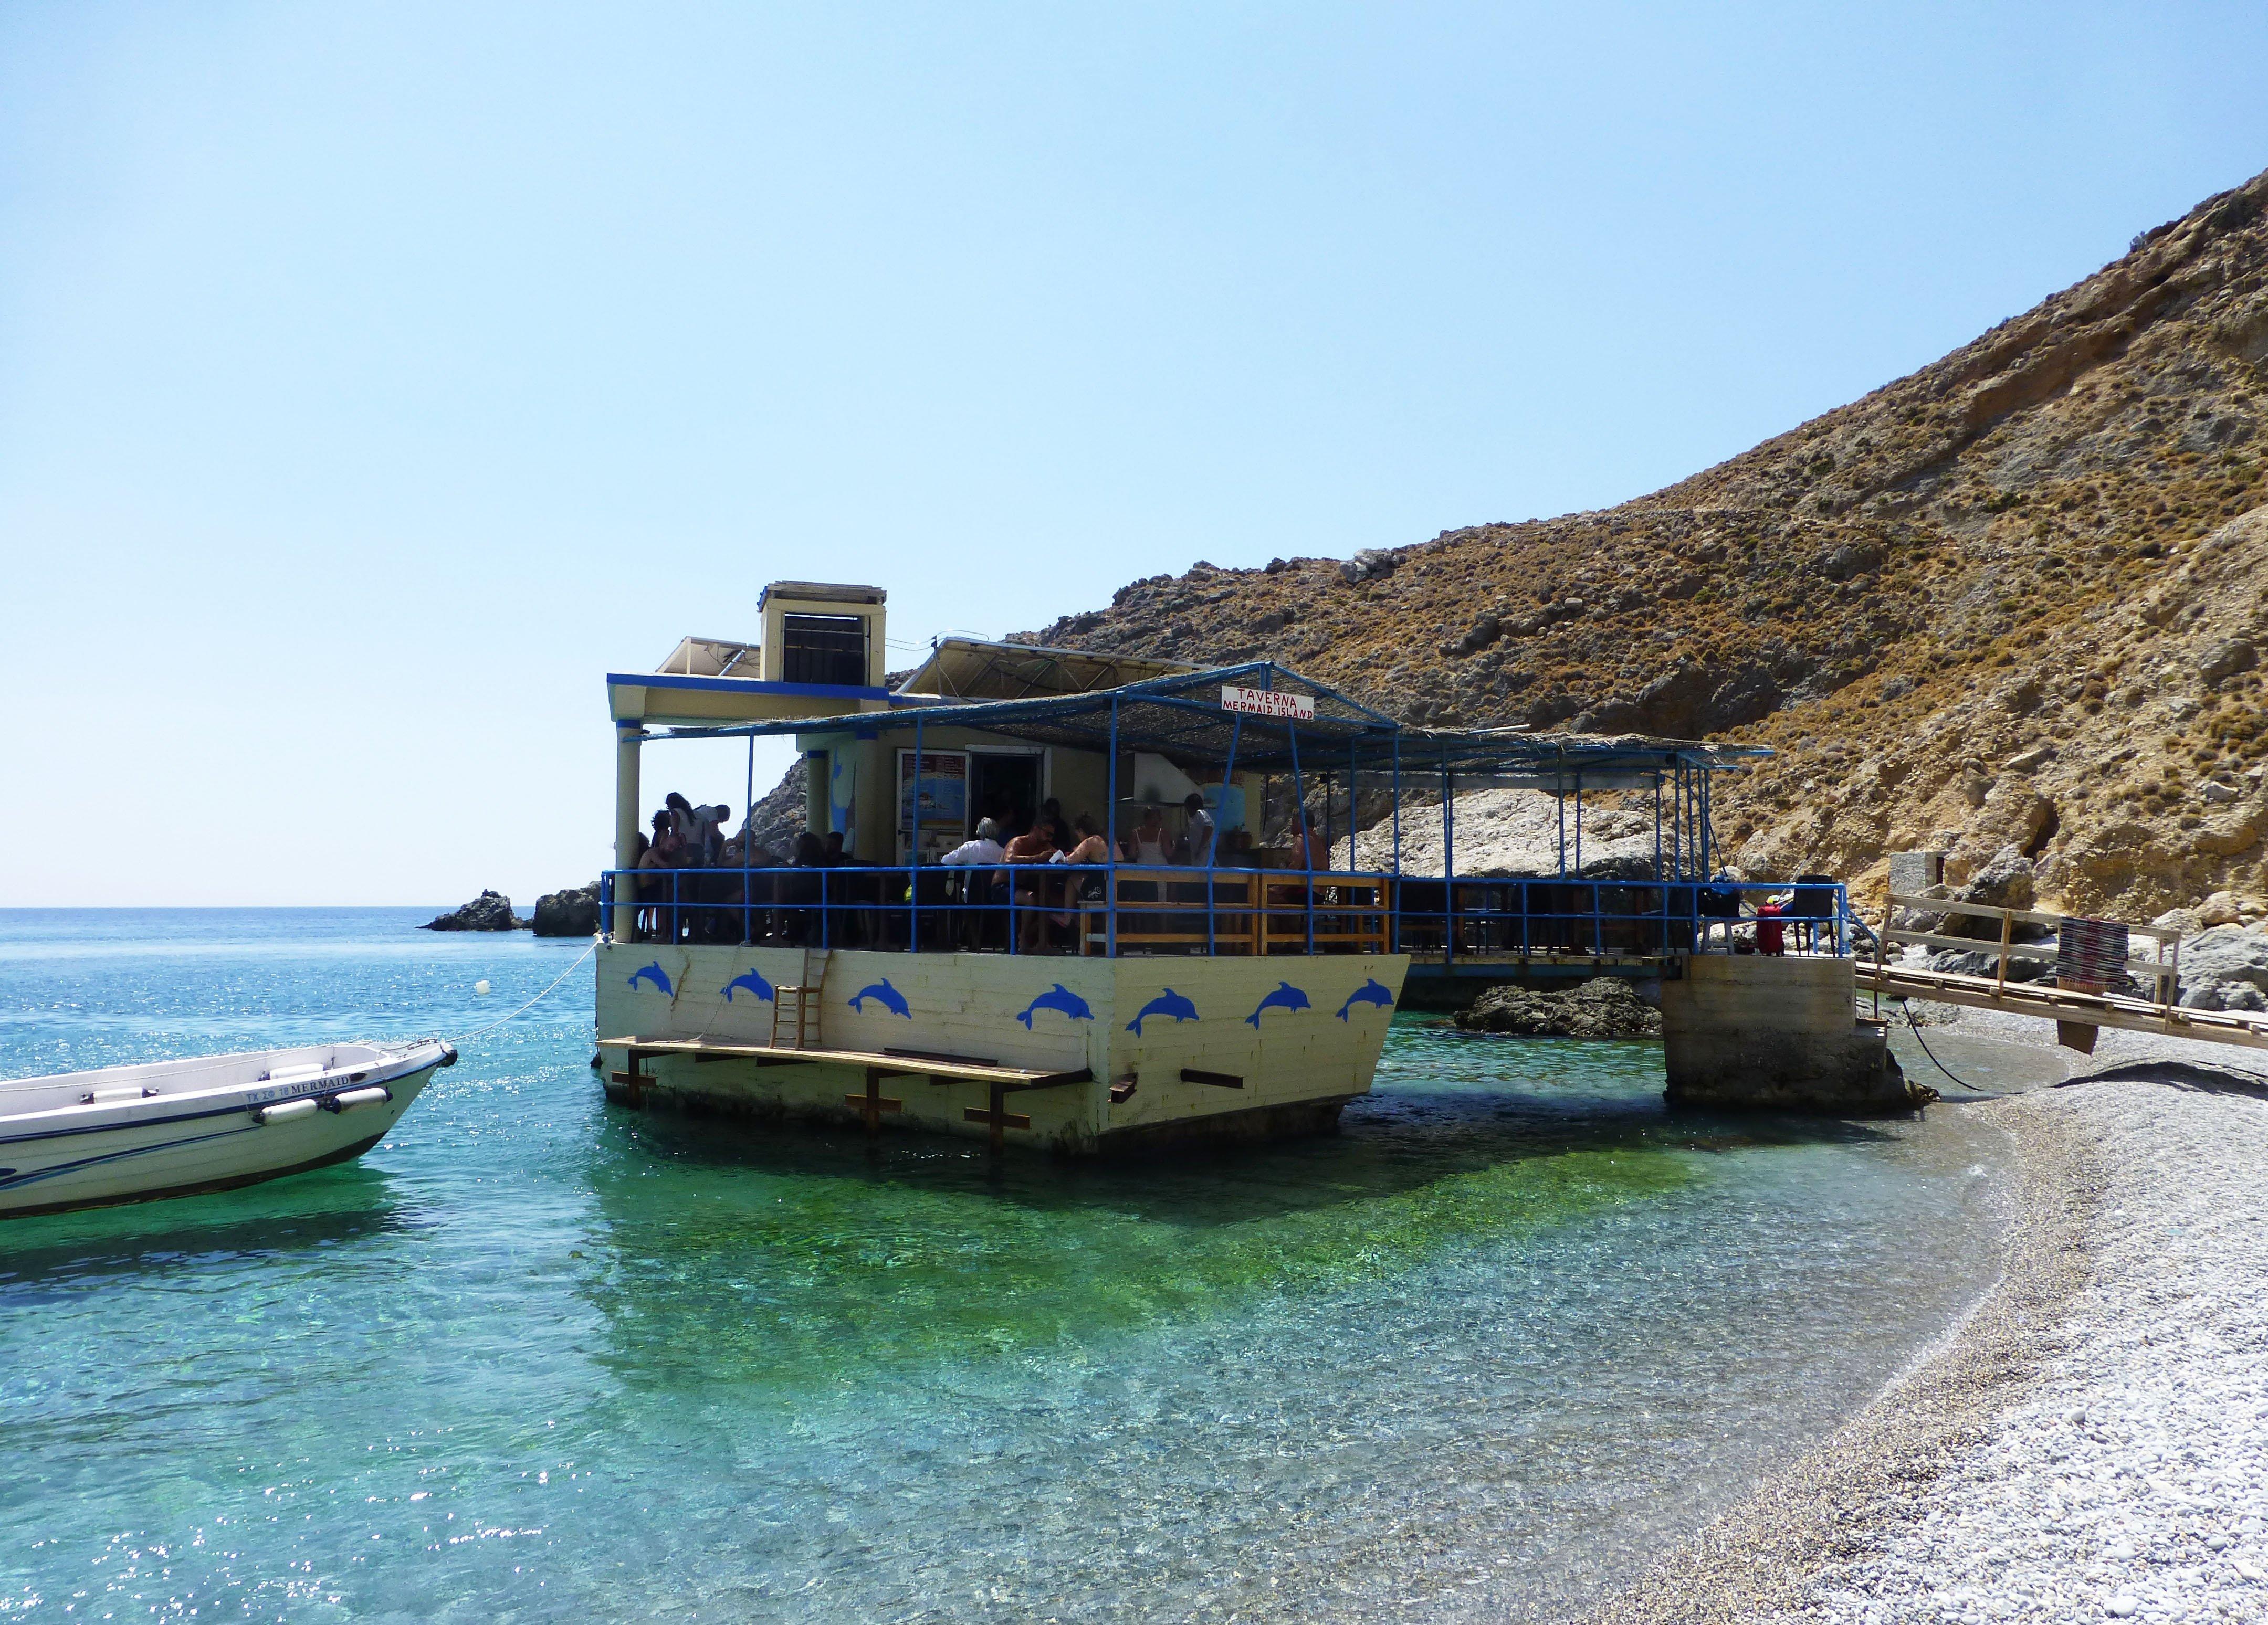 Glyca_nera_spiaggia_taverna